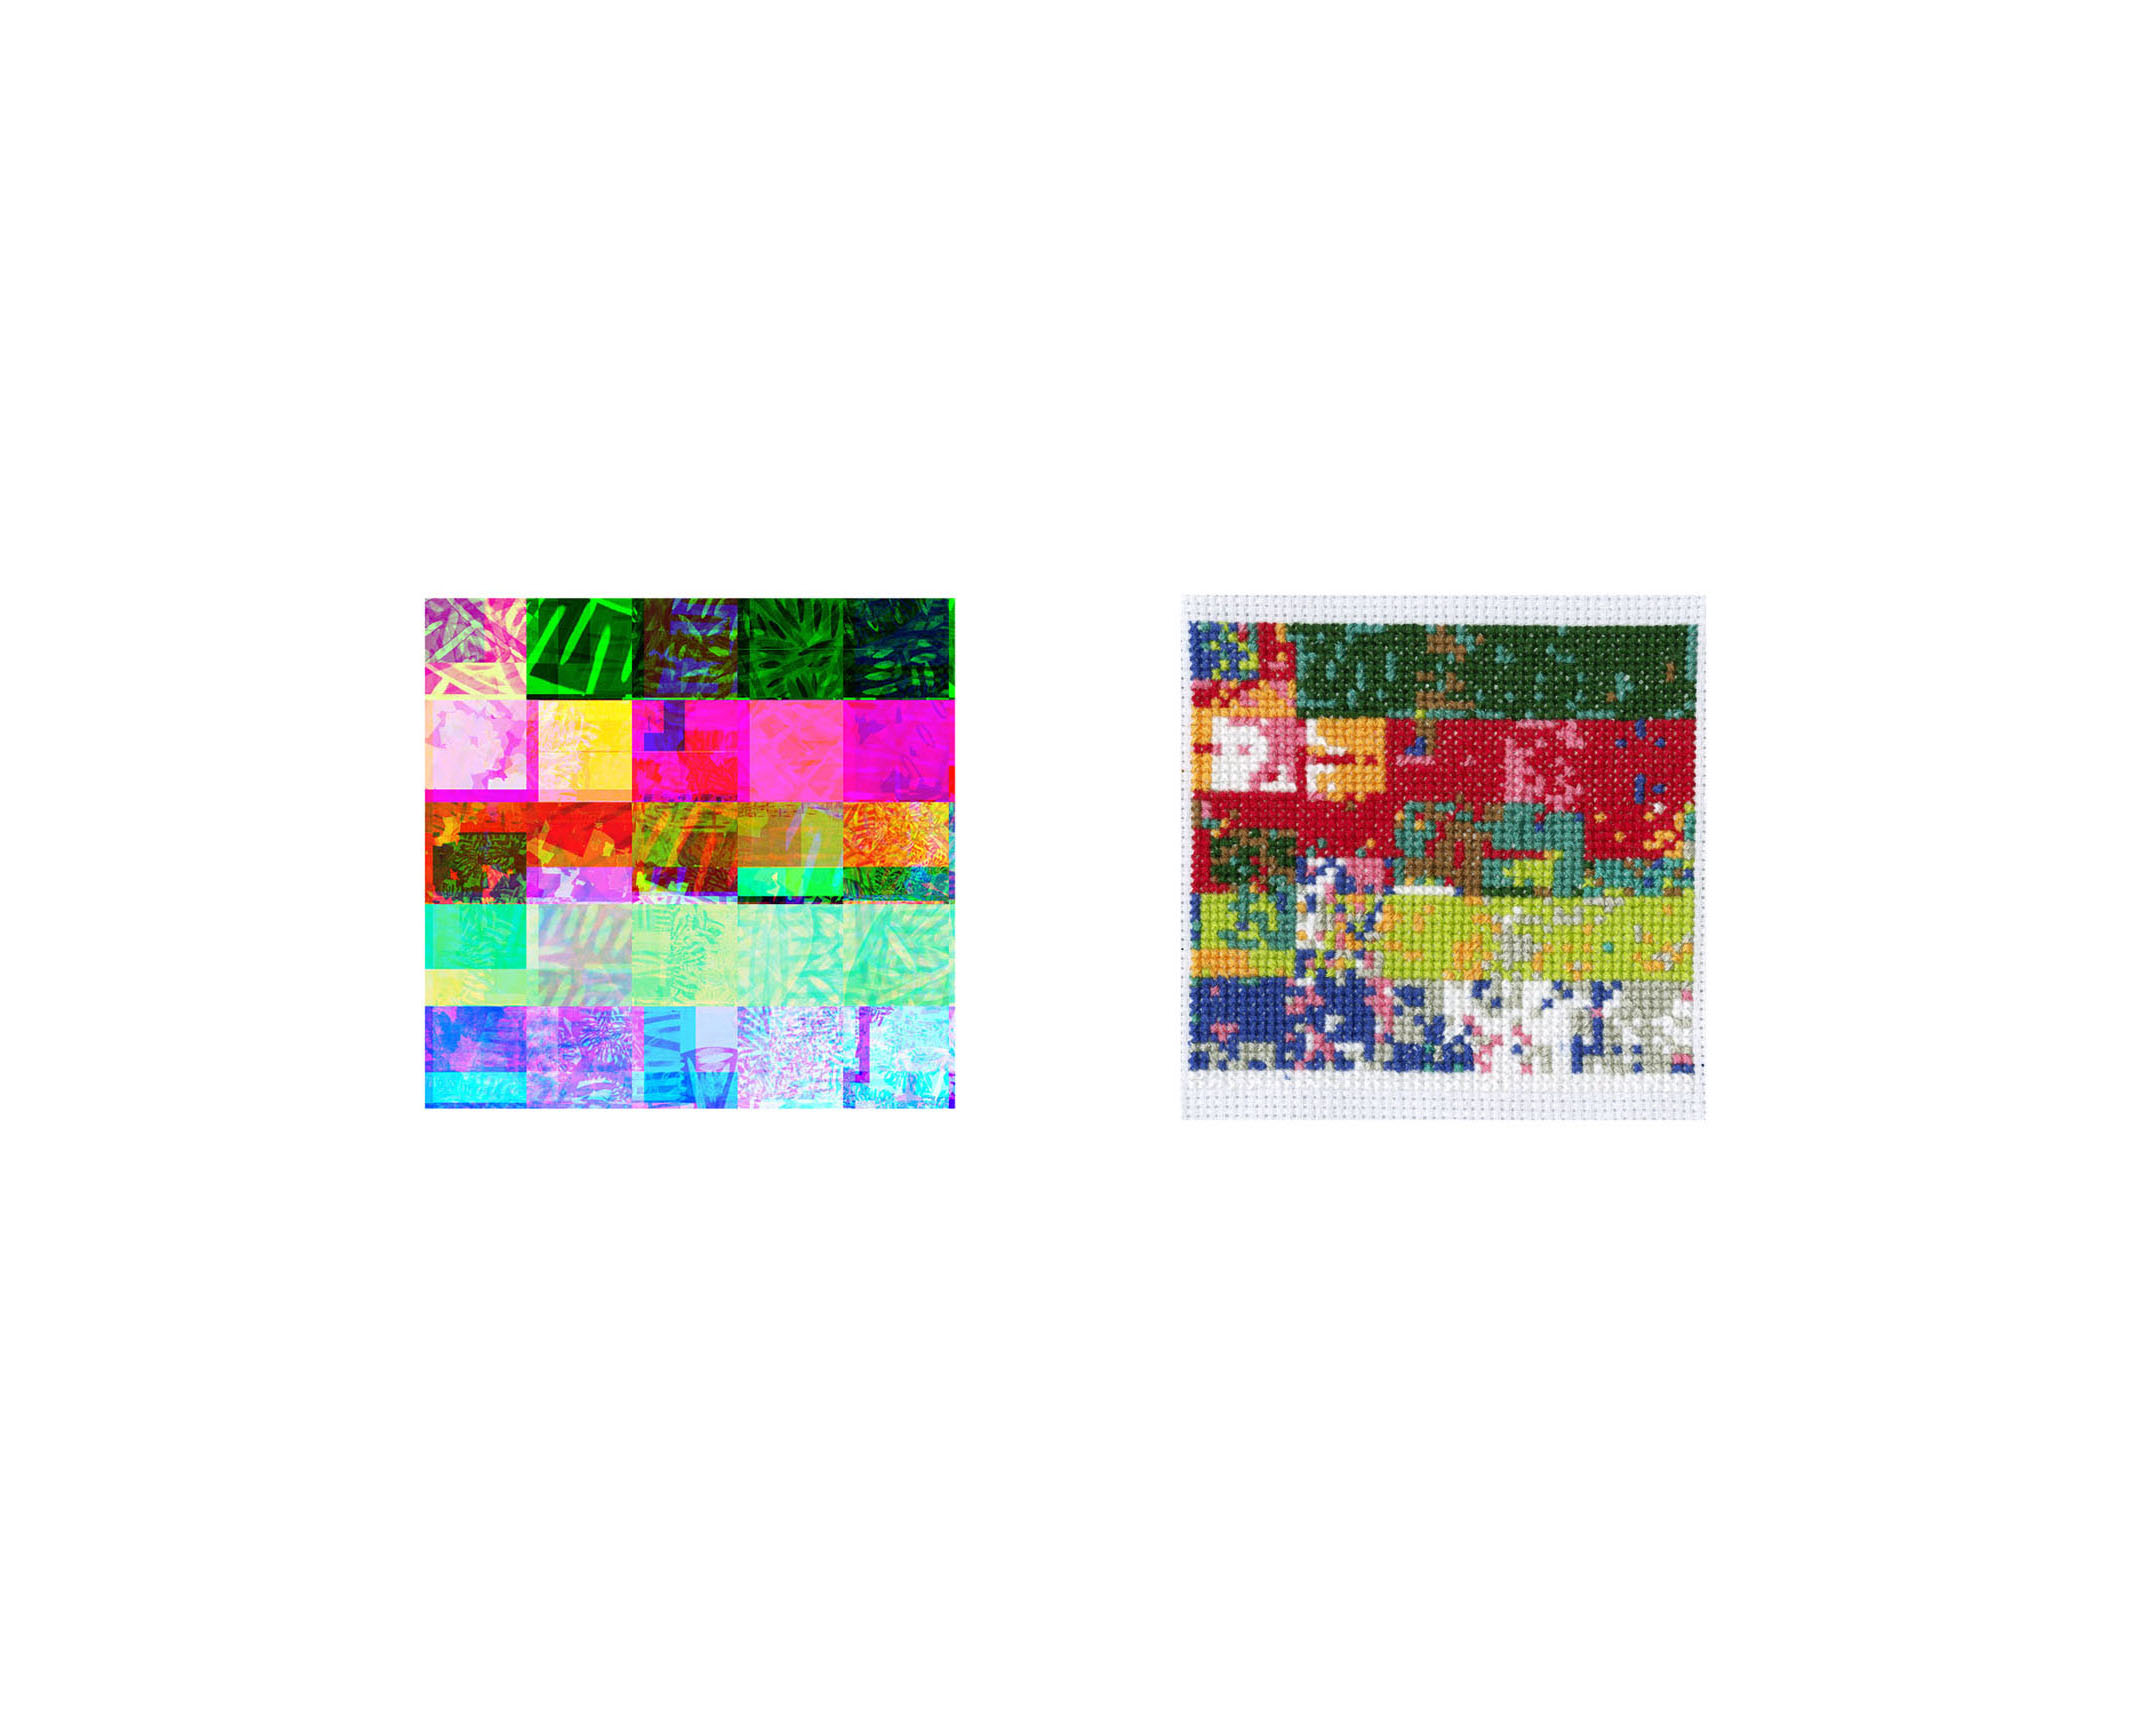 Glitch Series 01 - Crop_3.jpg